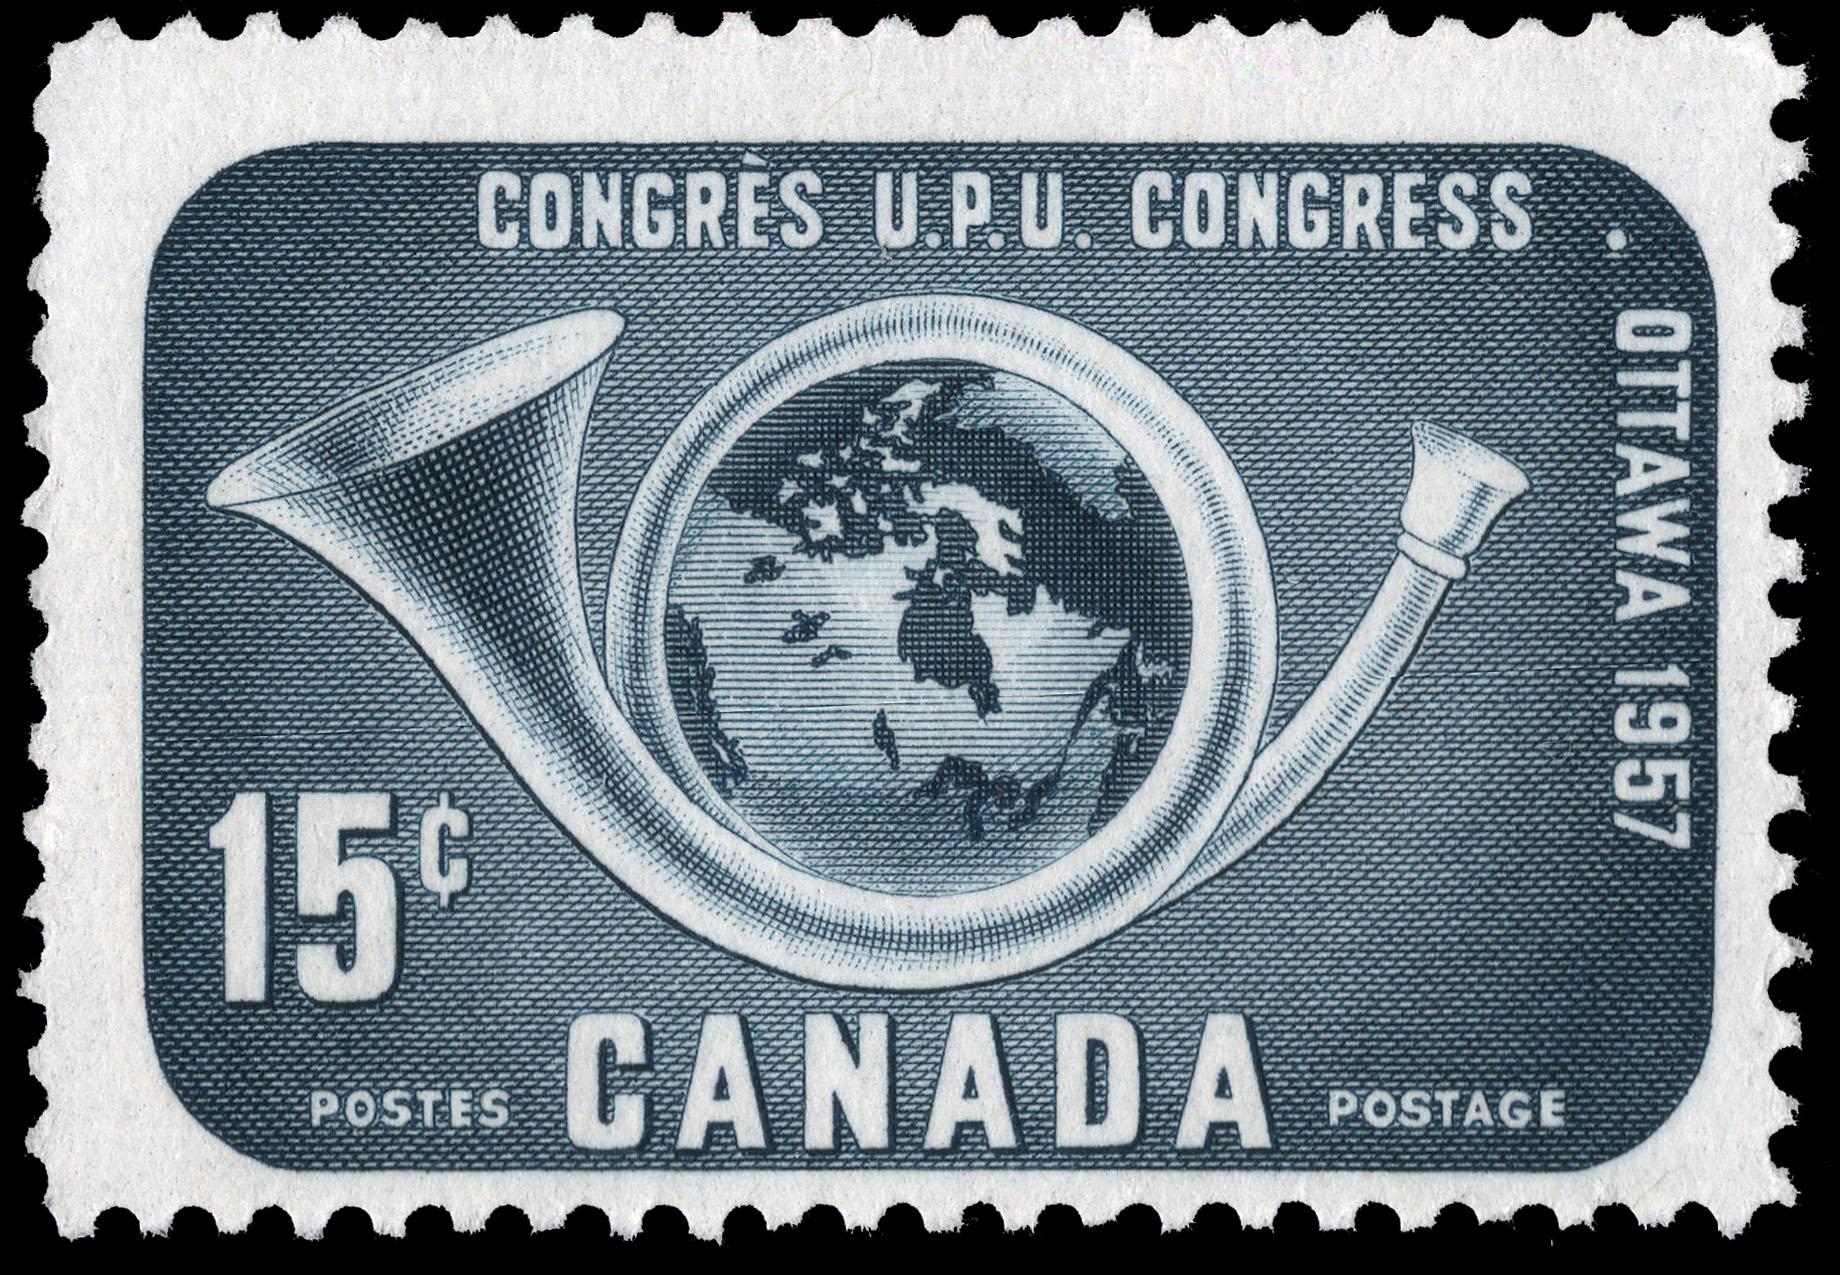 Universal Postal Union Congress, Ottawa, 1957 Canada Postage Stamp